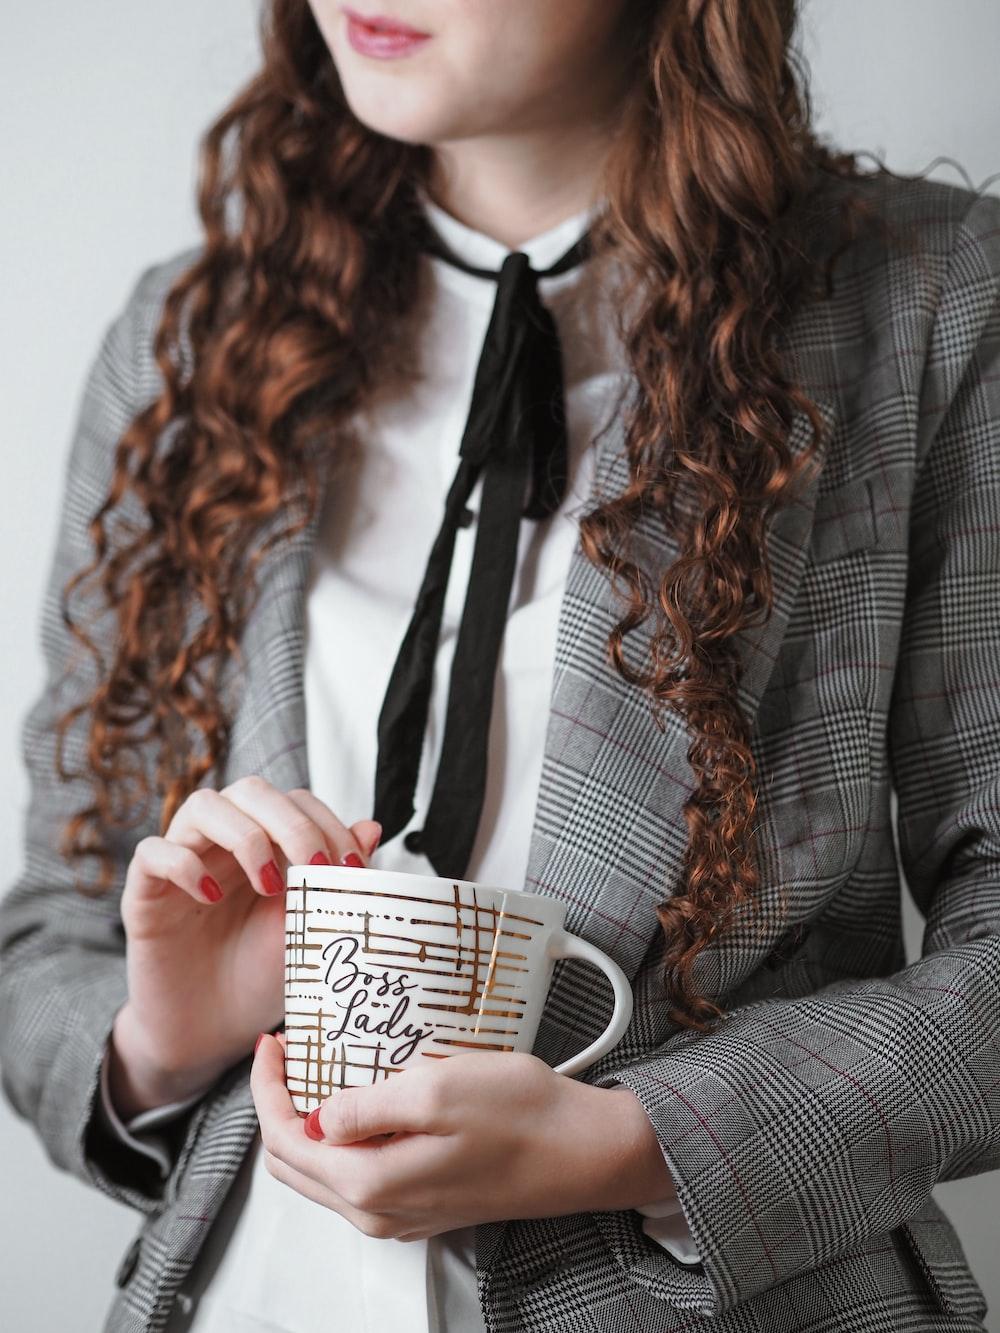 woman in gray blazer holding white and black ceramic mug